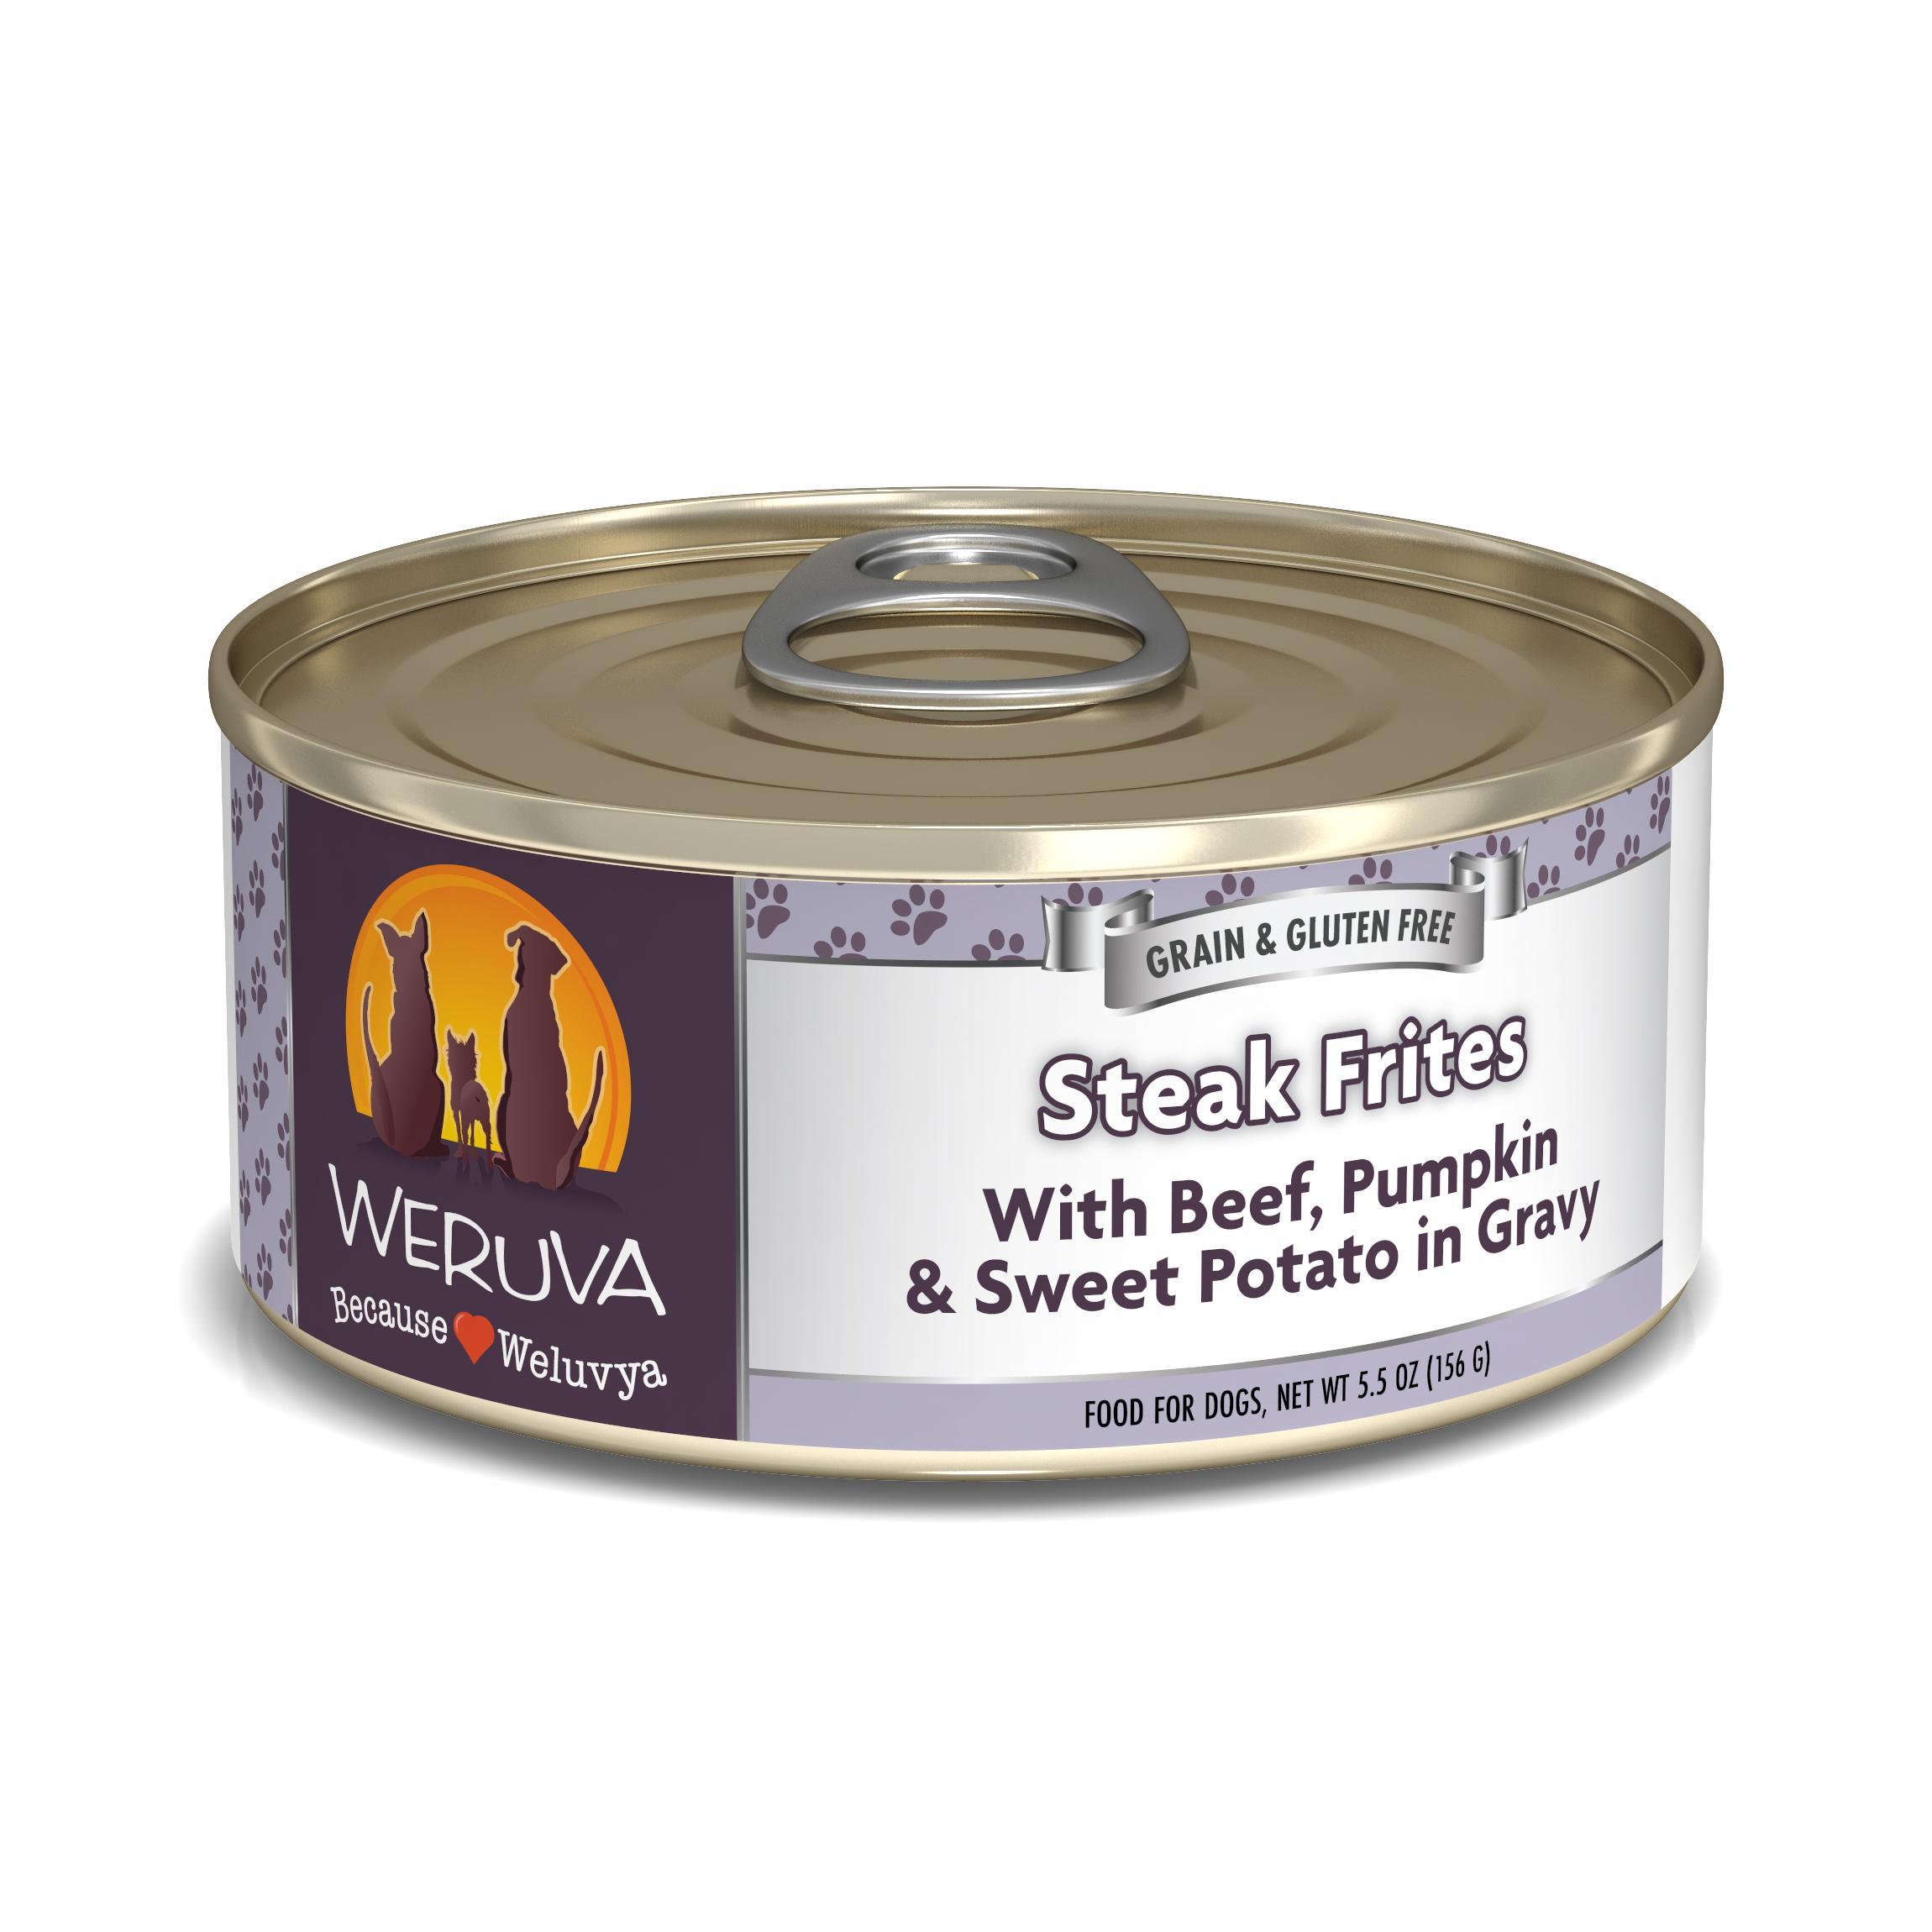 Weruva Dog Classic Steak Frites with Beef, Pumpkin & Sweet Potatoes in Gravy Grain-Free Wet Dog Food Image